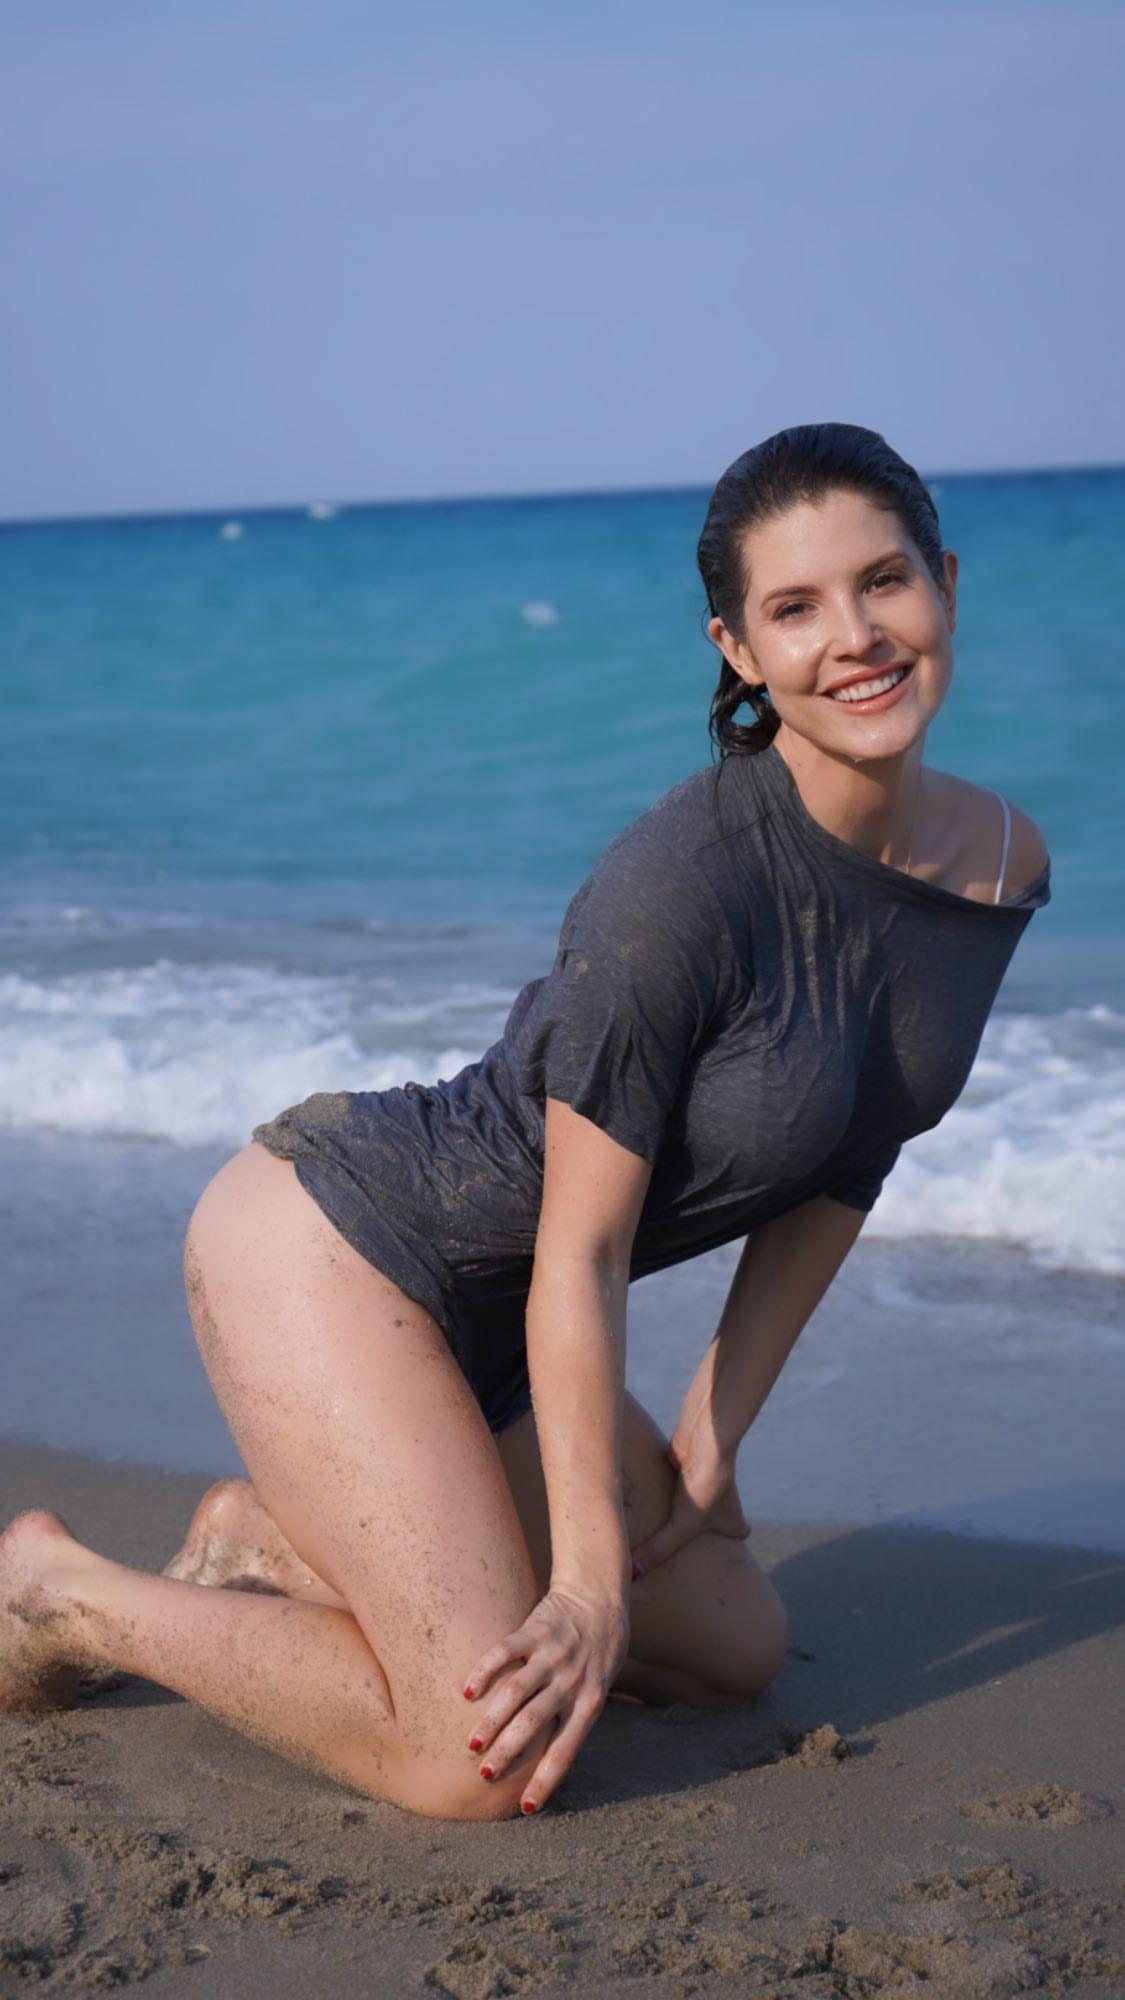 Amanda Cerny In Wet Shirt